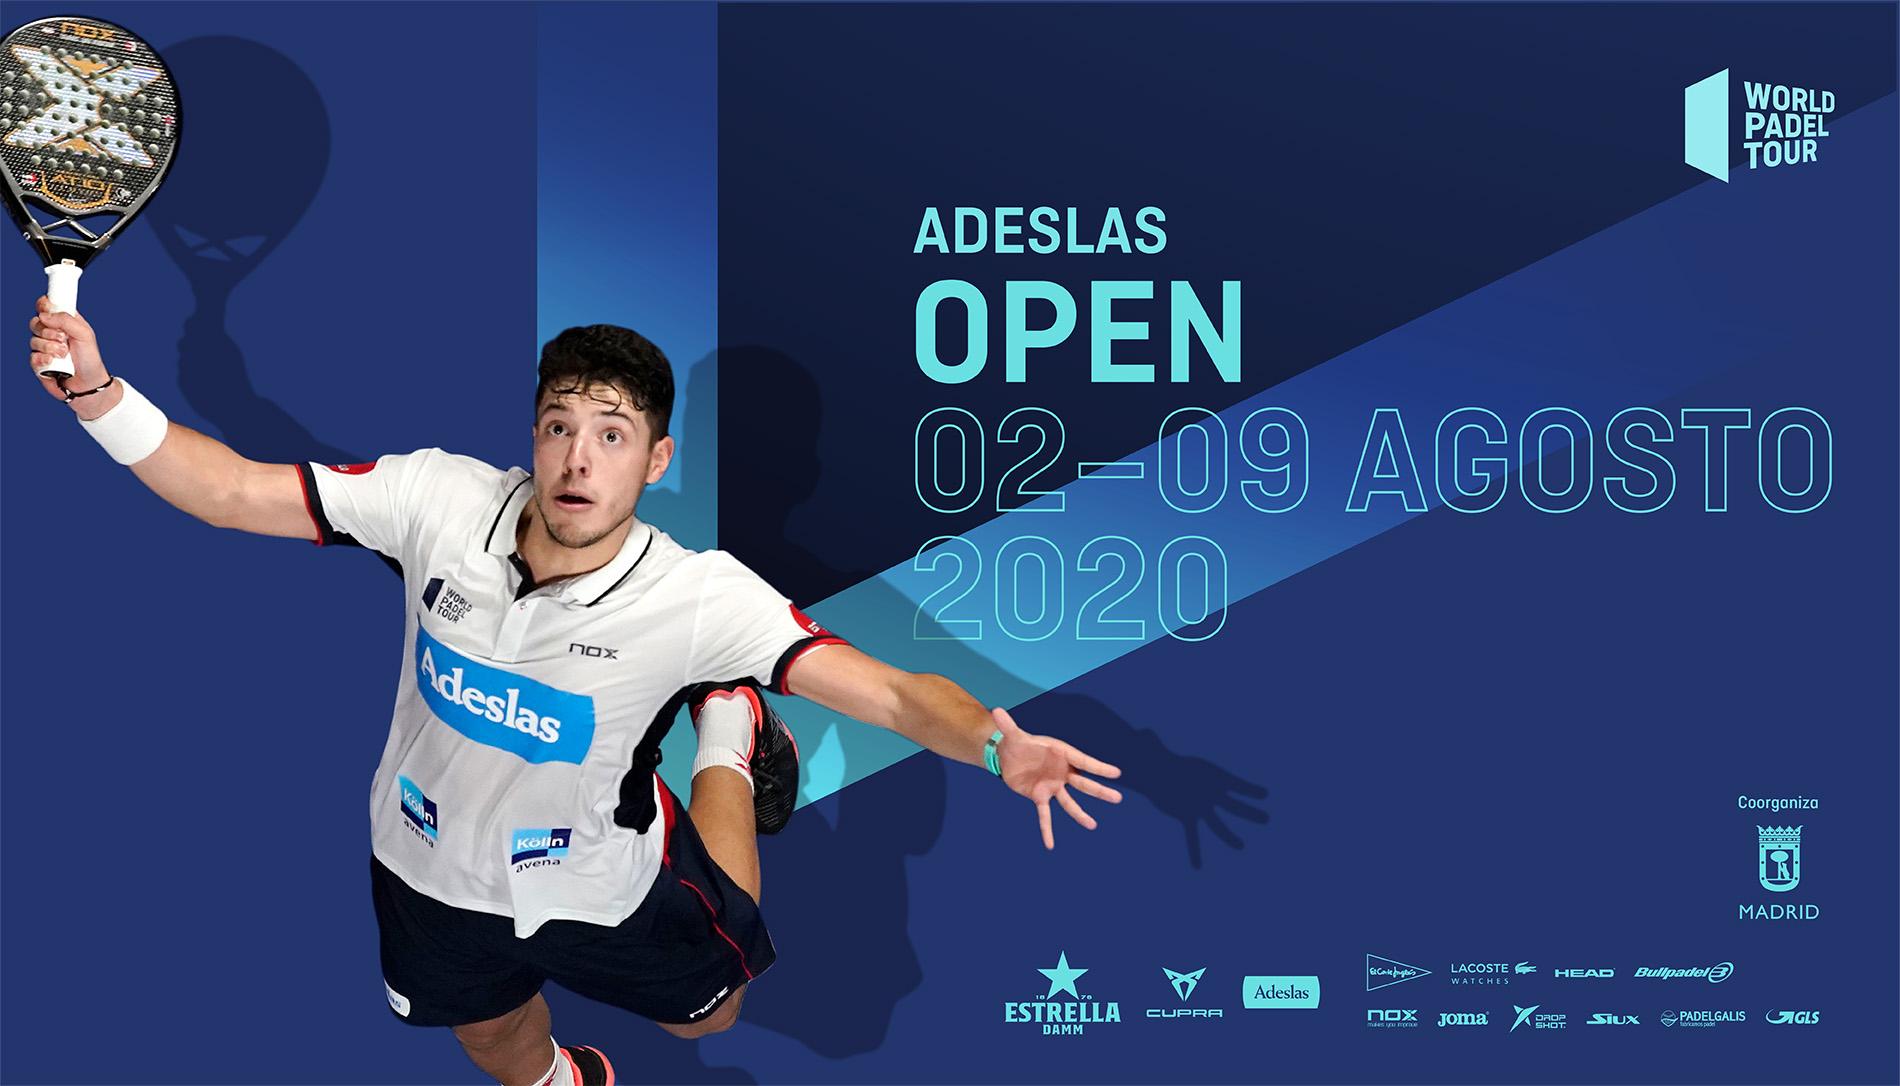 Adeslas Open Madrid Arena